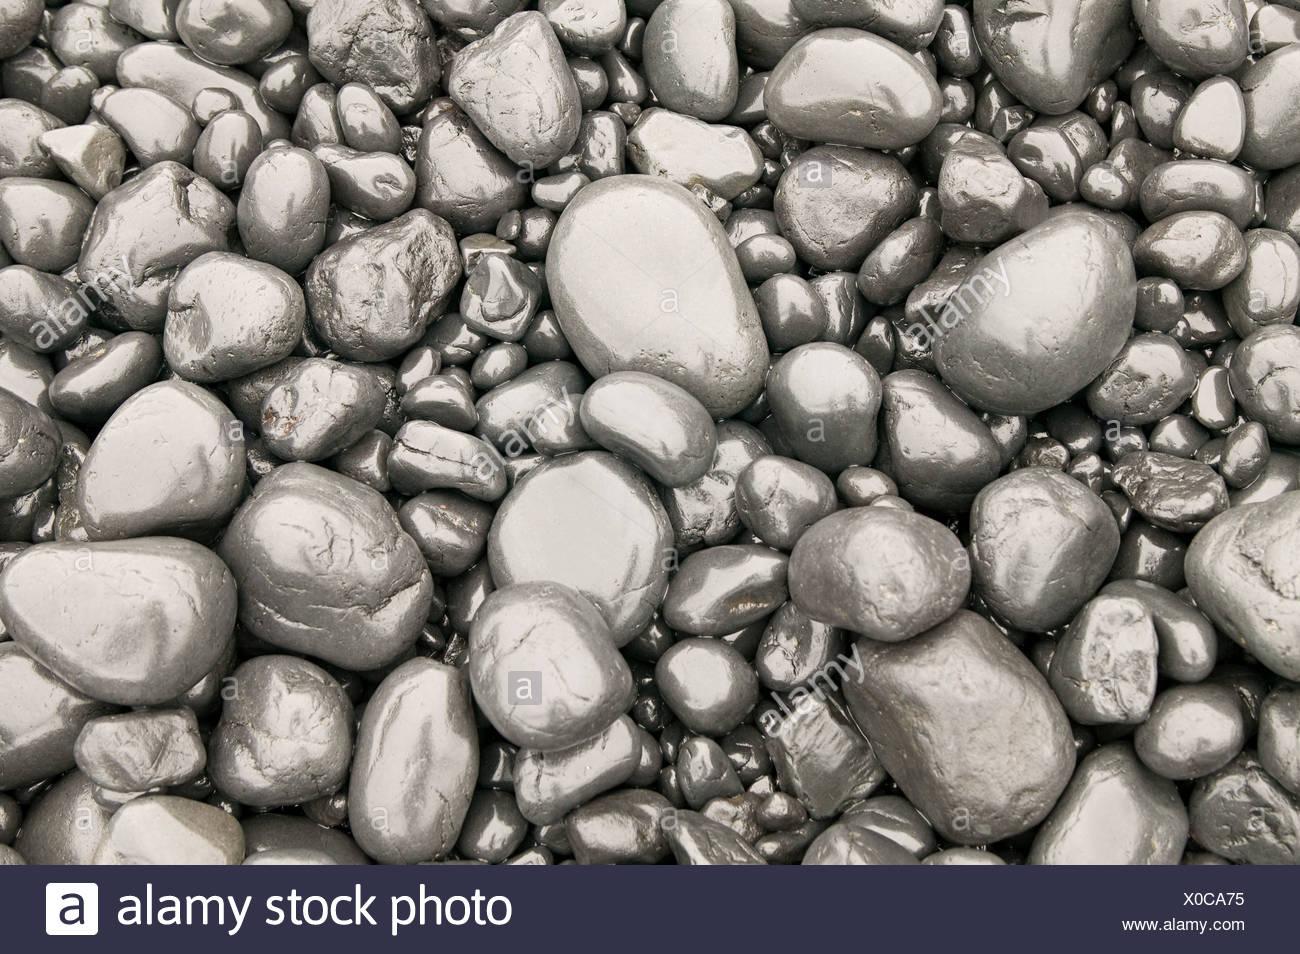 Grey Pebbles Photos & Grey Pebbles Images - Alamy